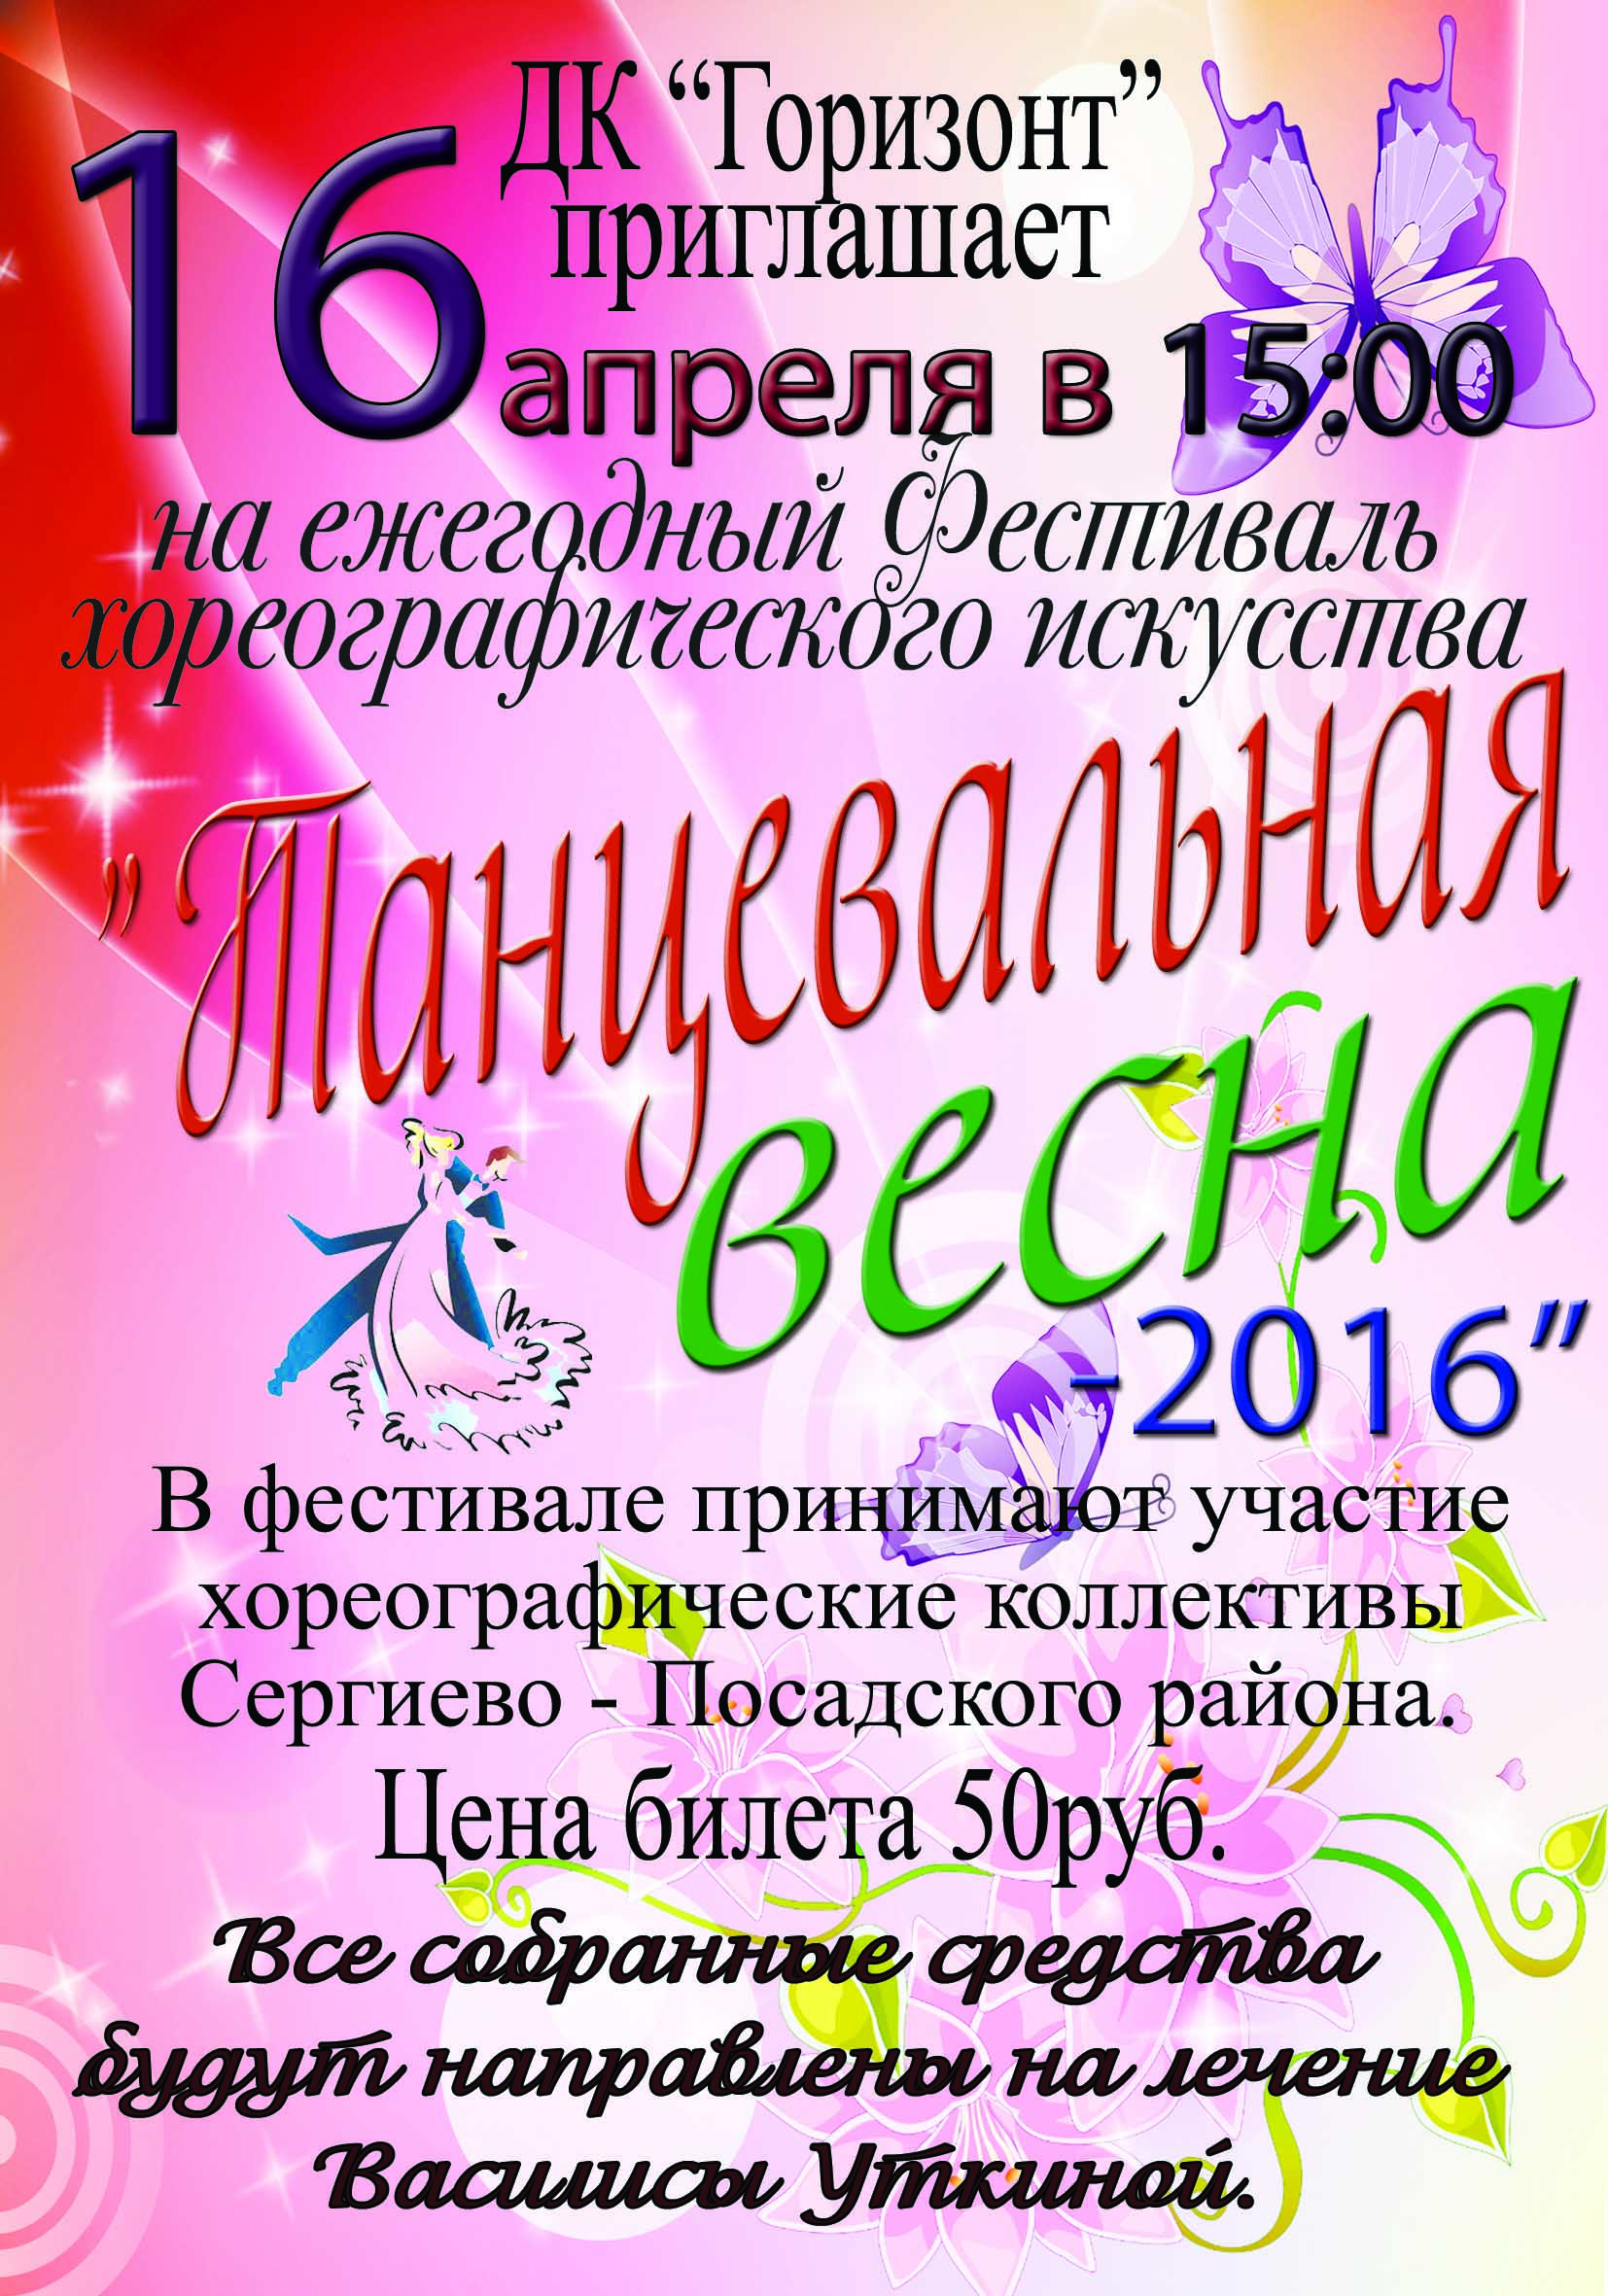 Танцев+Весна+2016+2